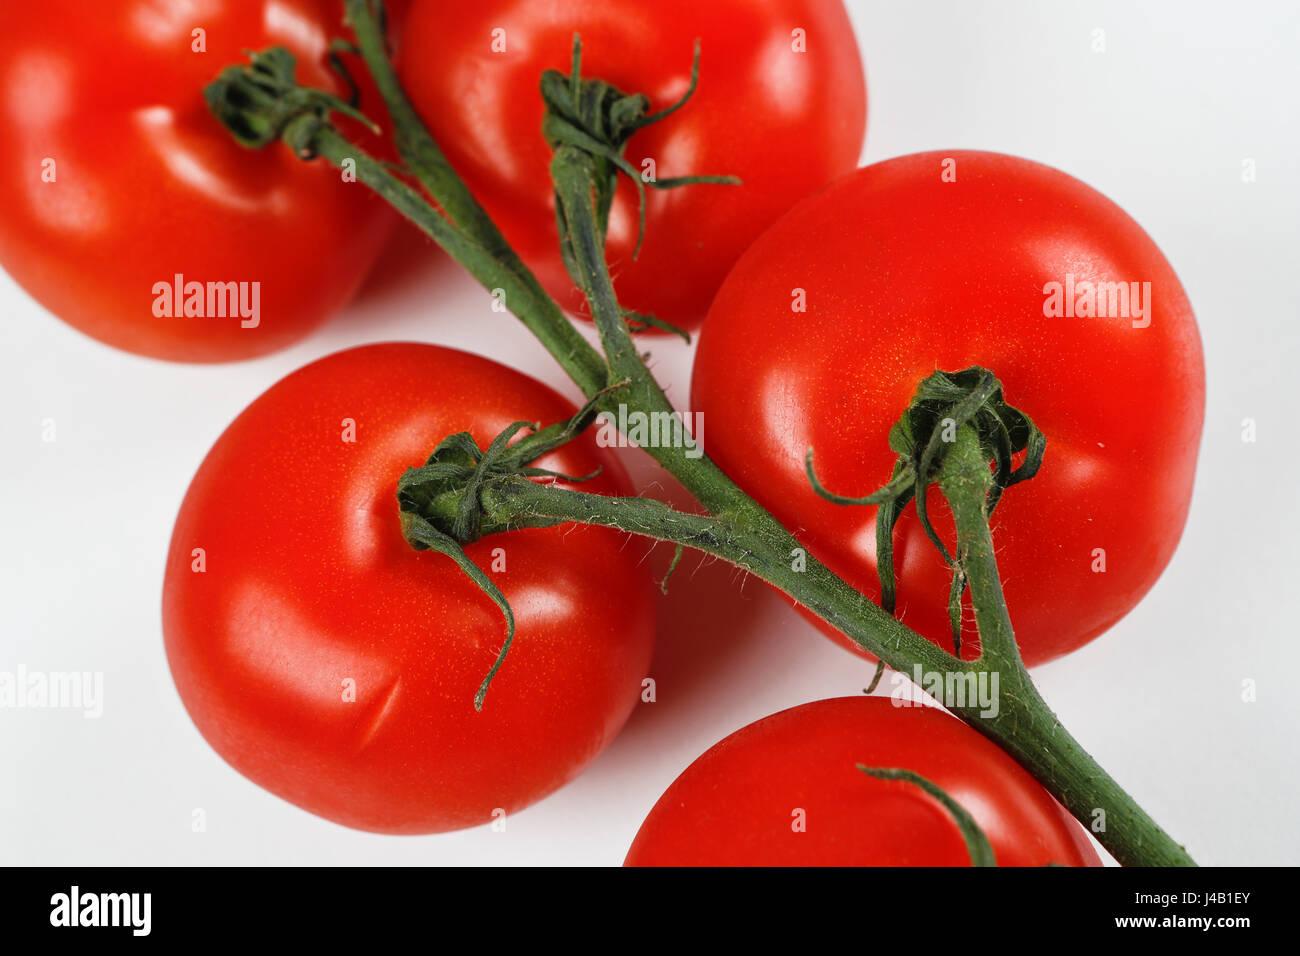 Tomates orgánicos. Conceptos alimentarios. Tomates. Ilustrativo Foto de stock